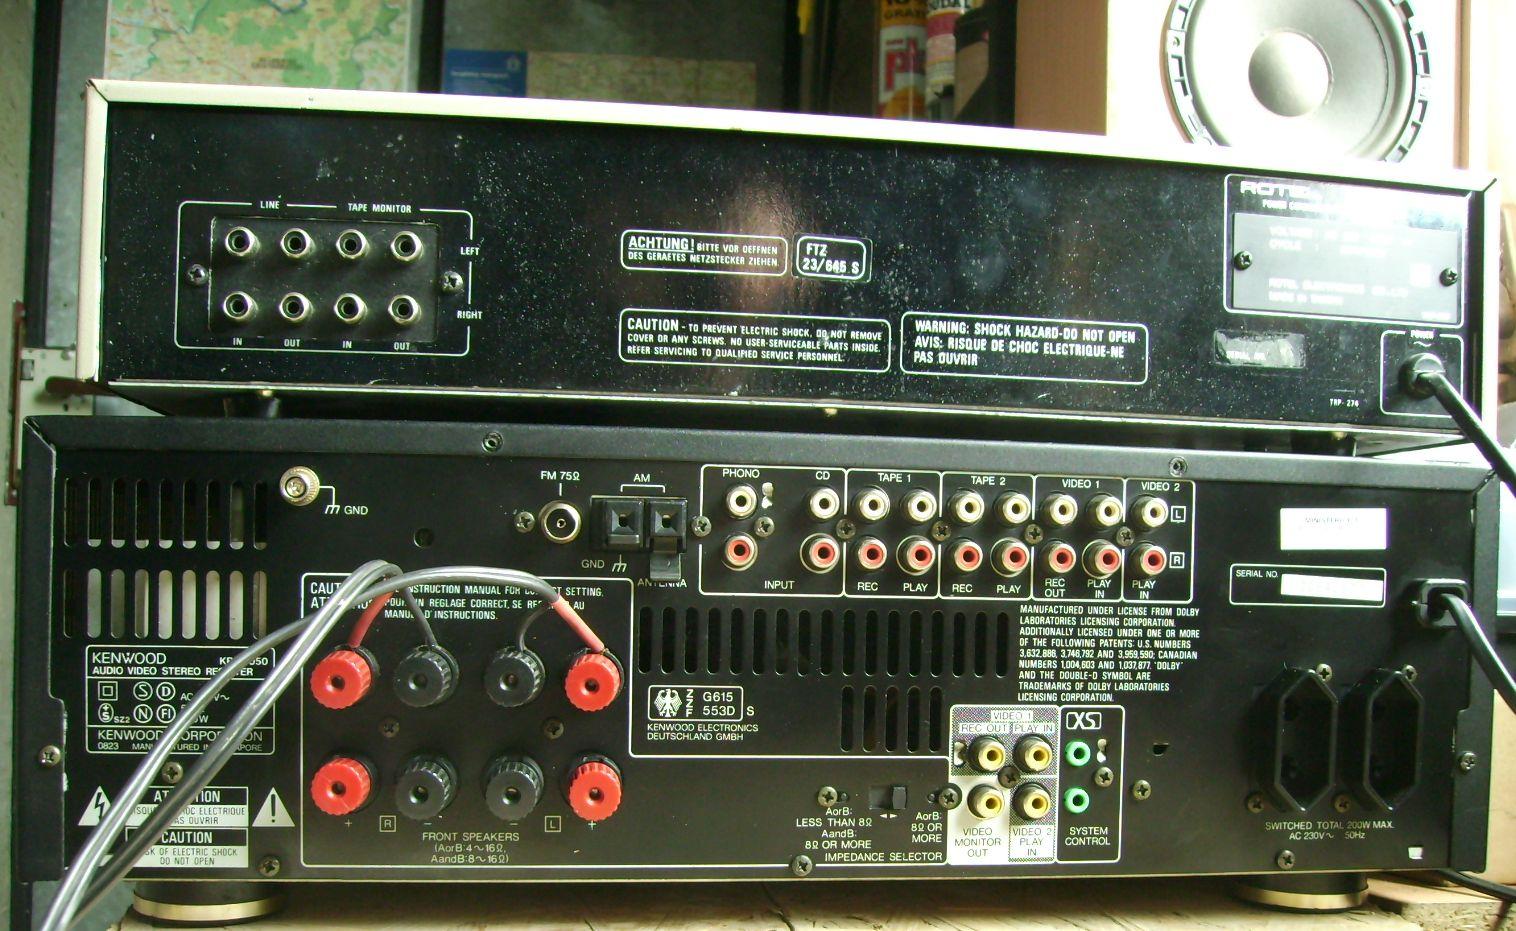 korektor do amplitunera - jak pod��czy� korektor do amplitunera z tape monitor?